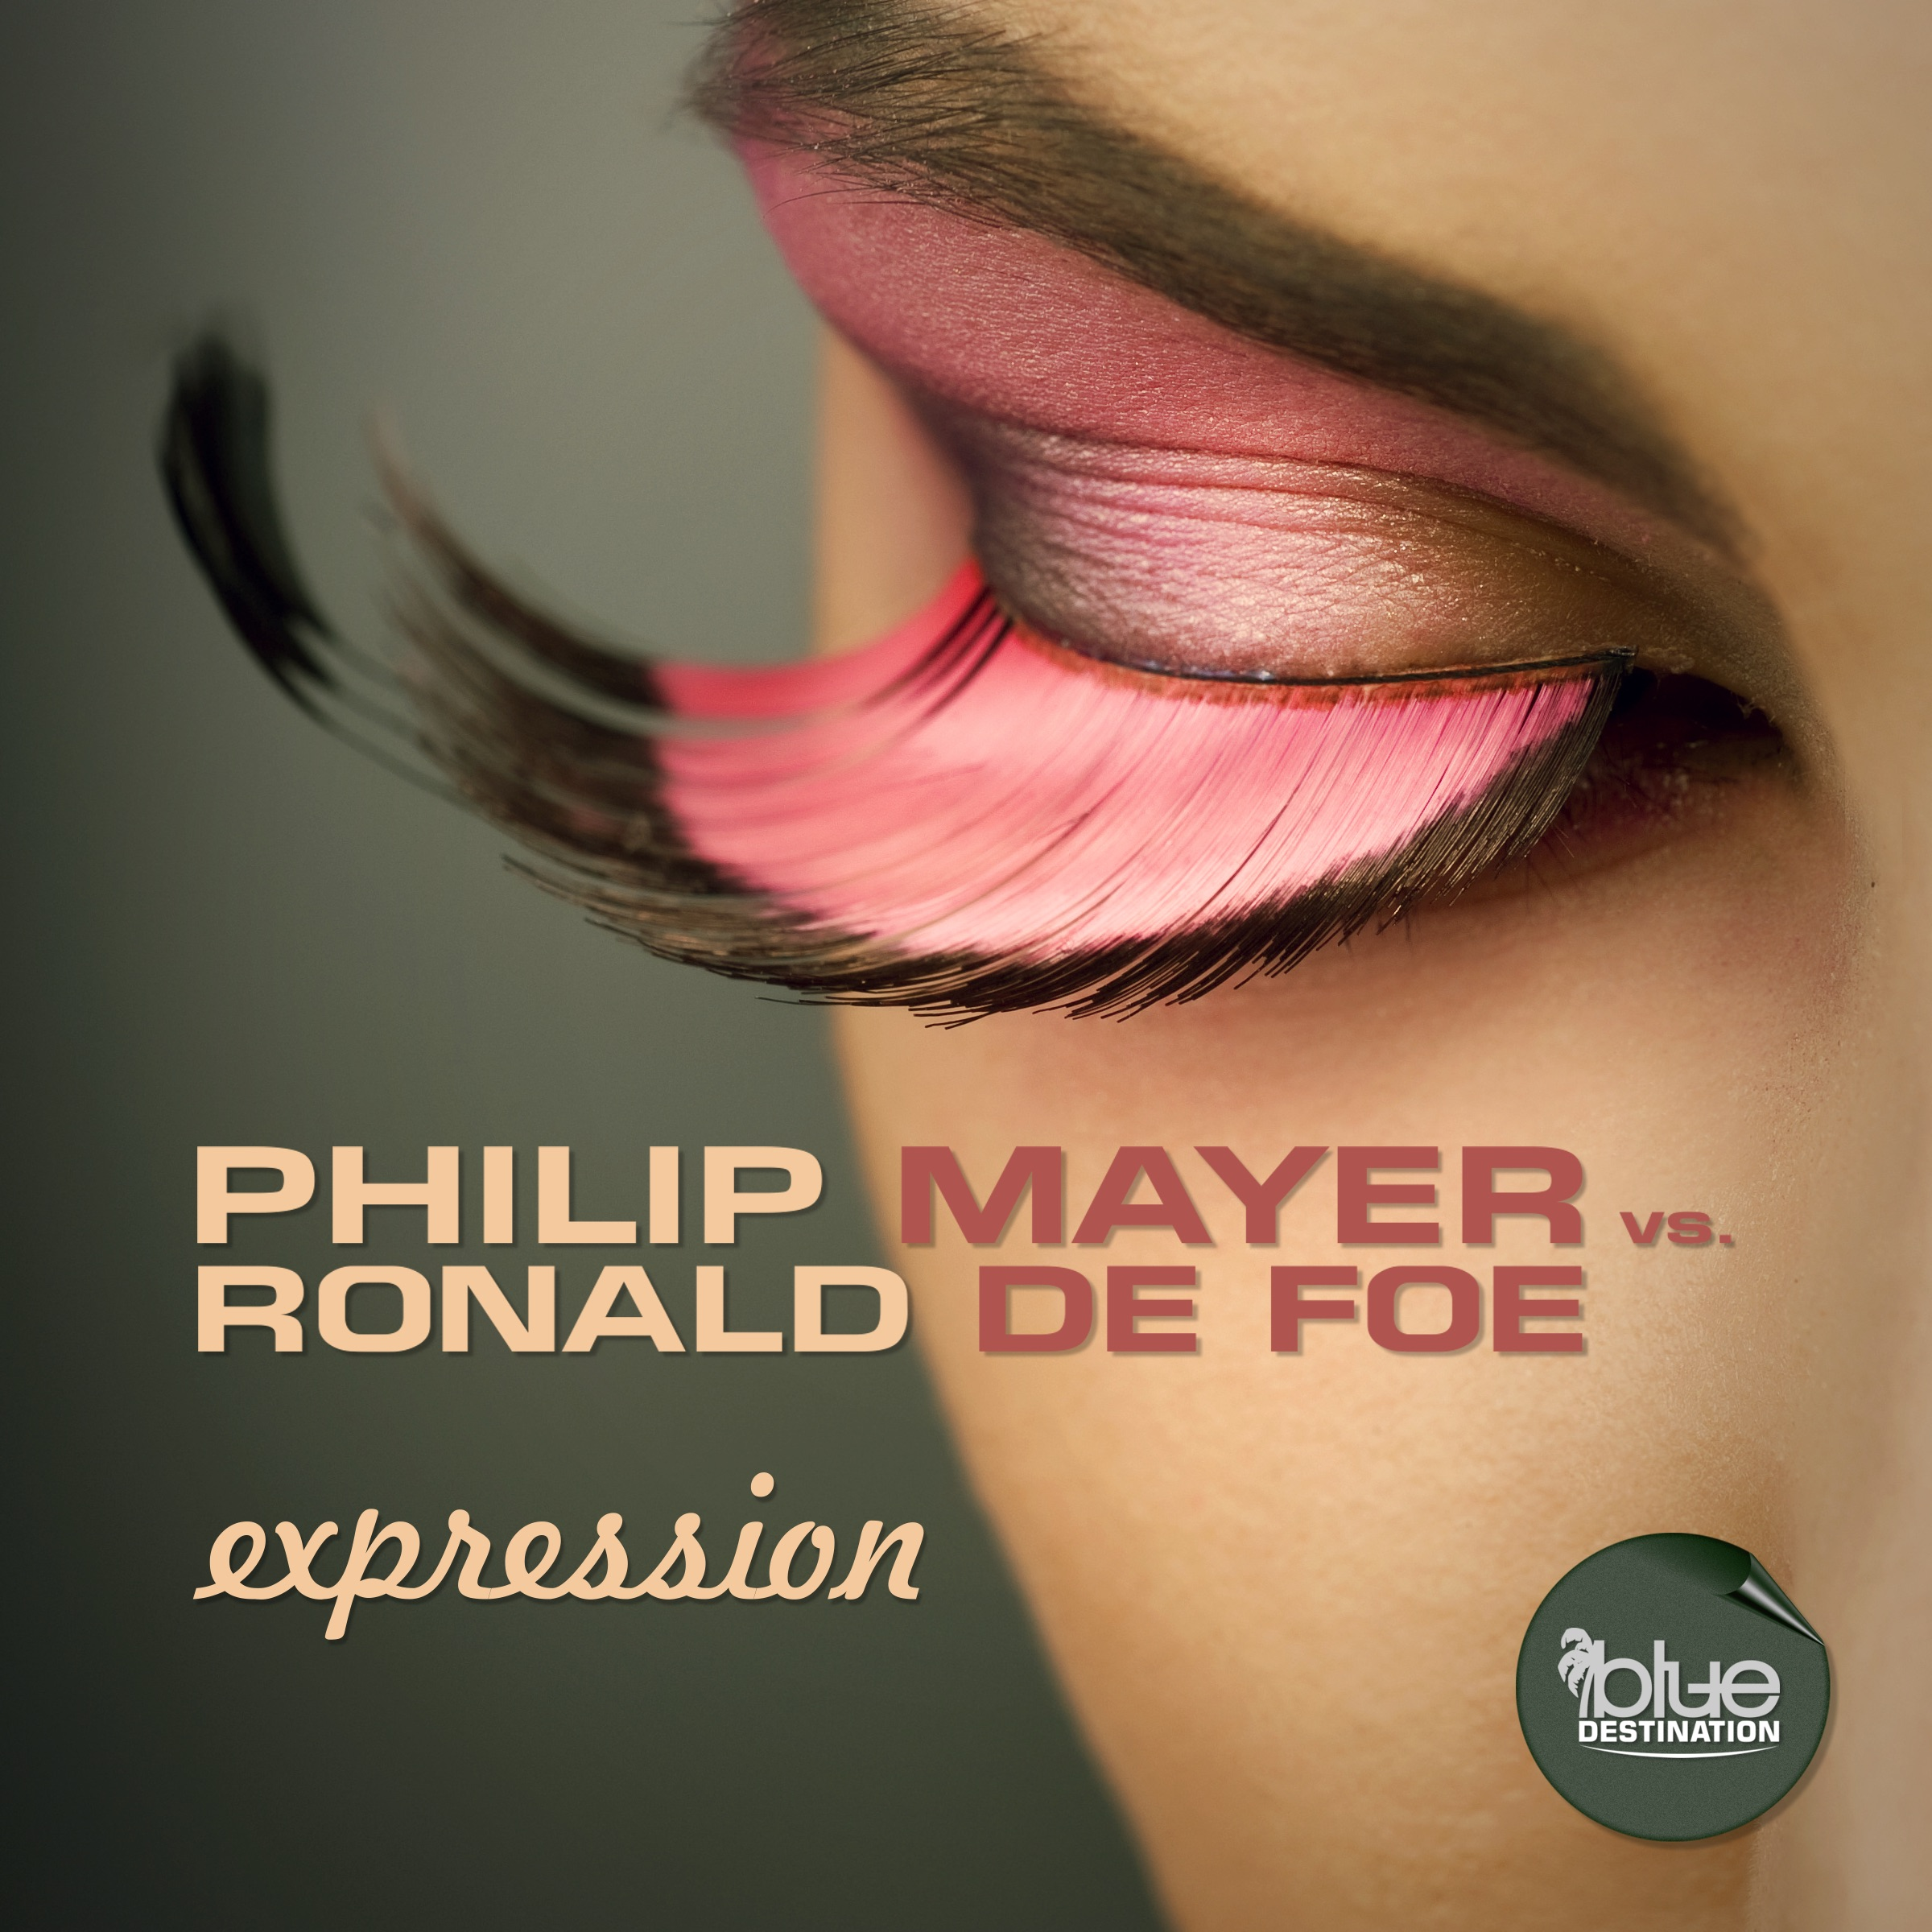 Expression (Radio Edit) [Philip Mayer vs. Ronald De Foe]